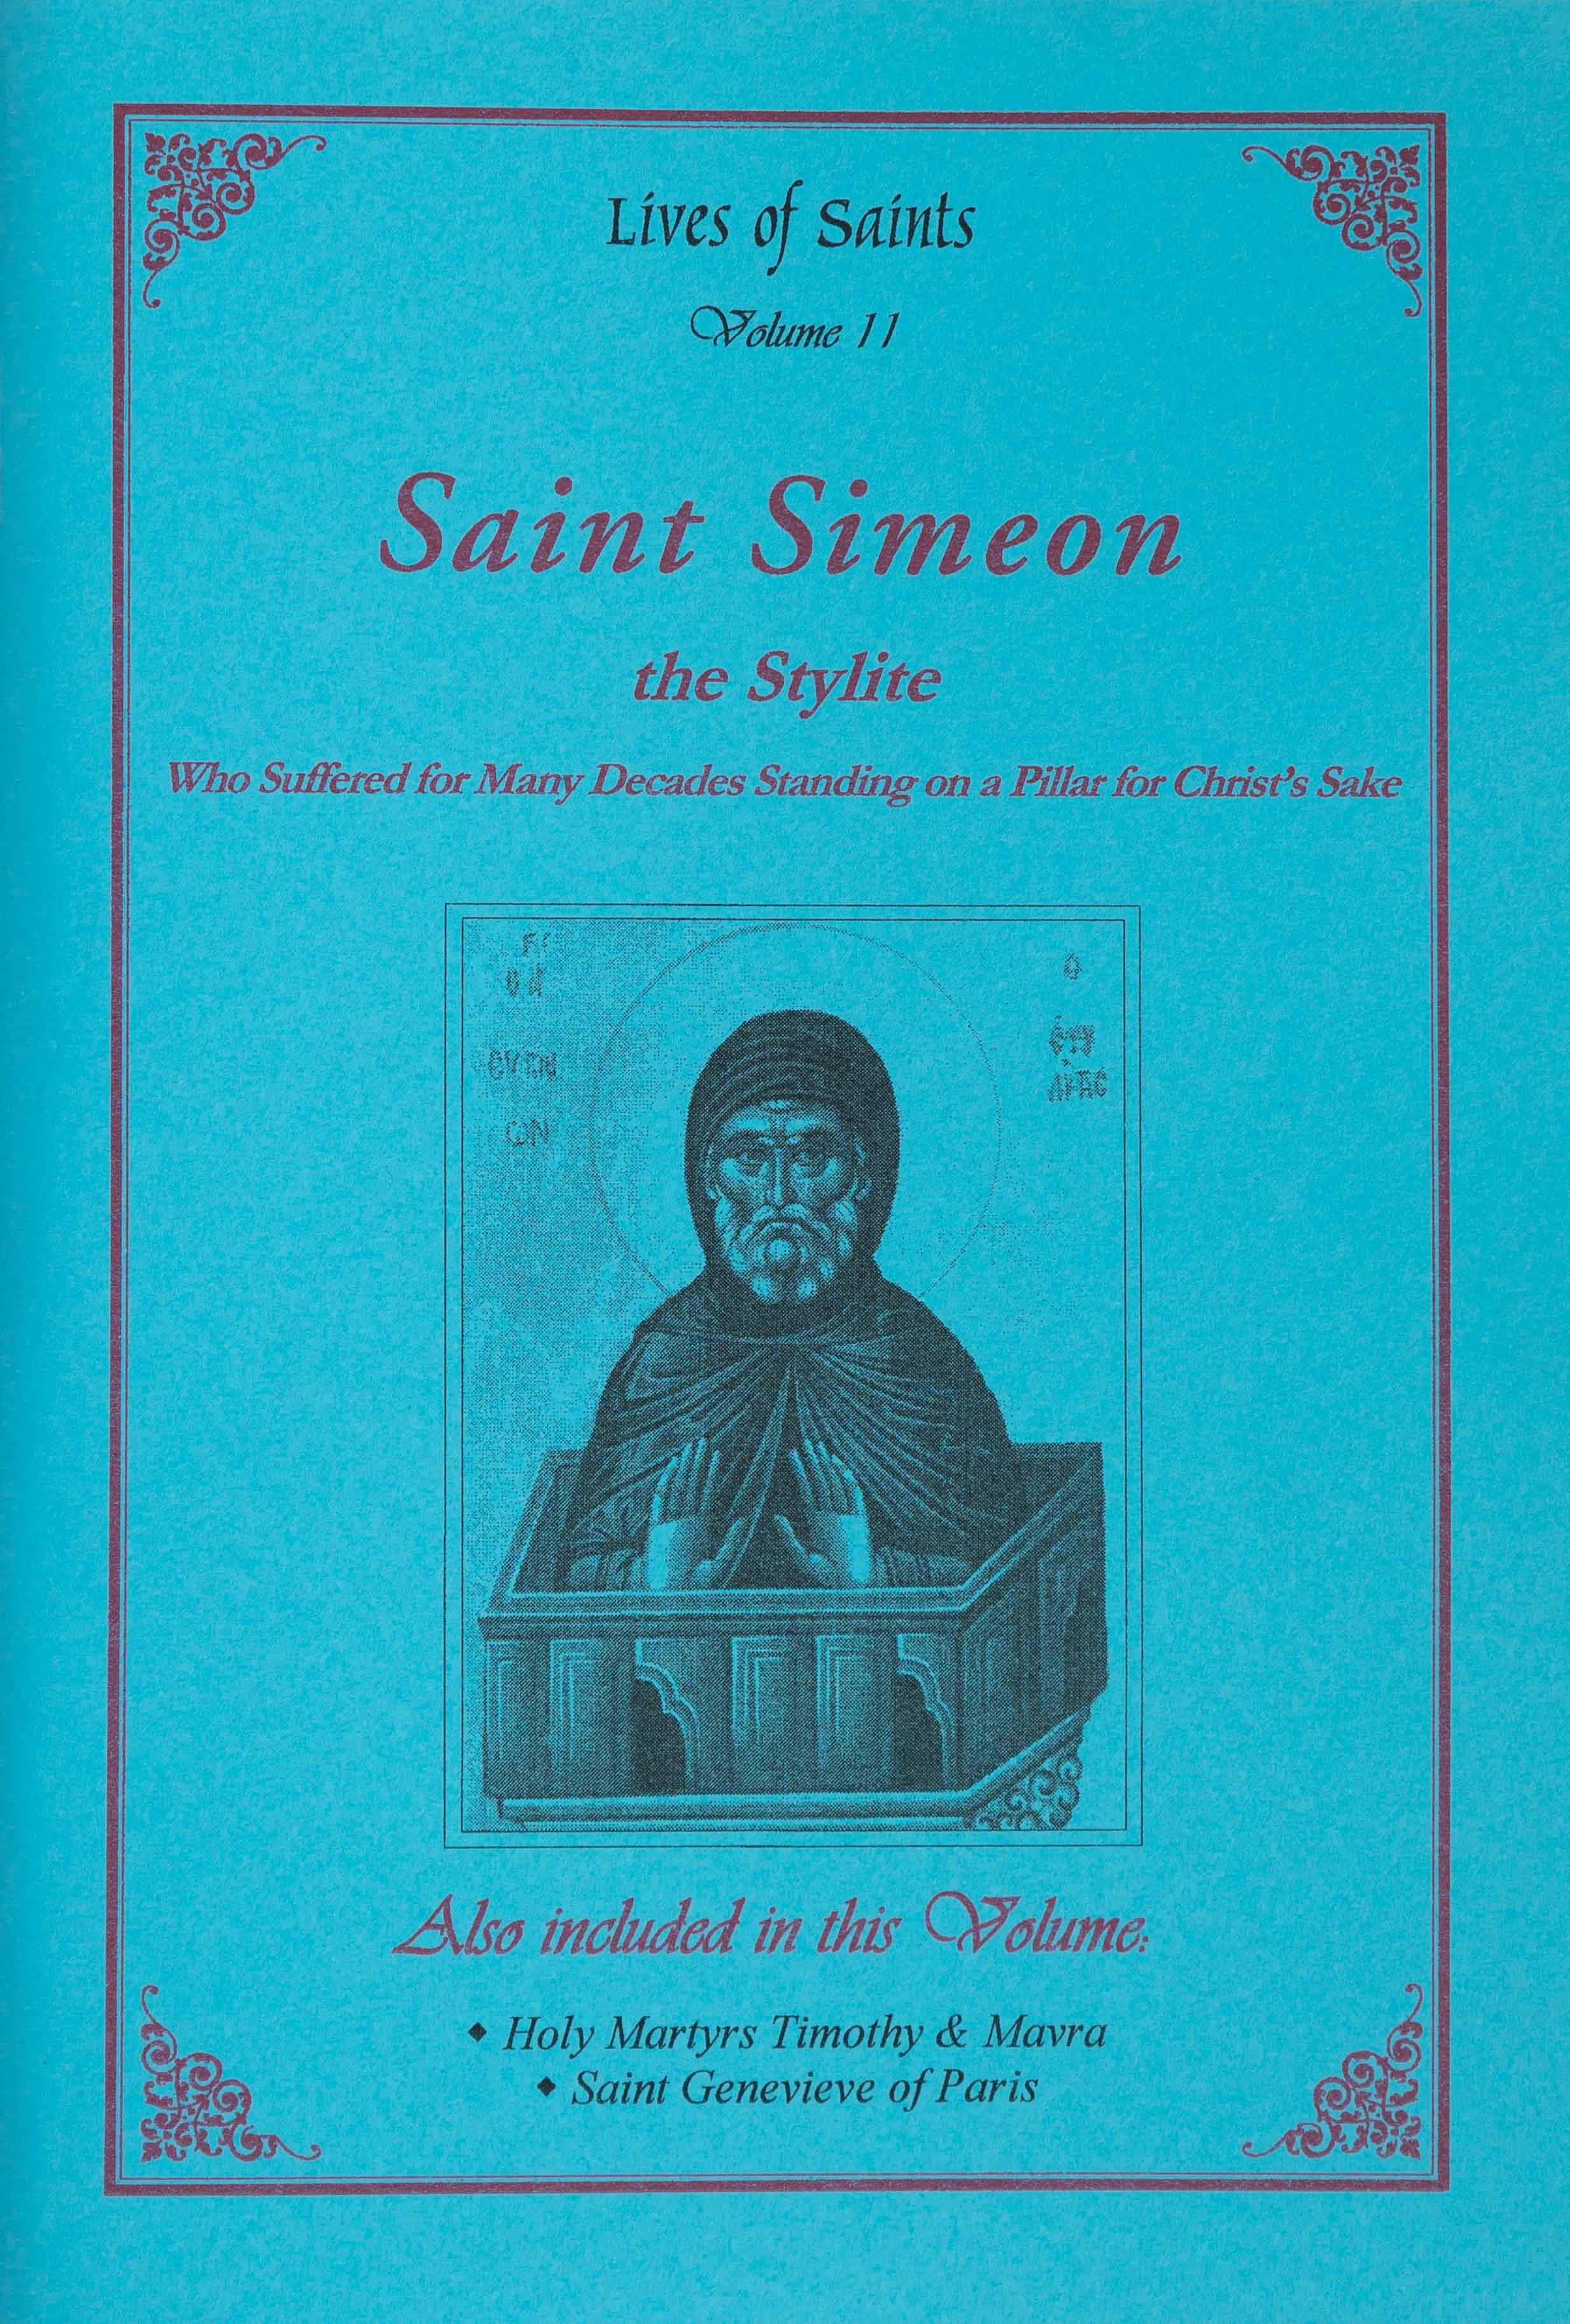 Lives of Saints Vol. 11: Saint Simeon the Stylite